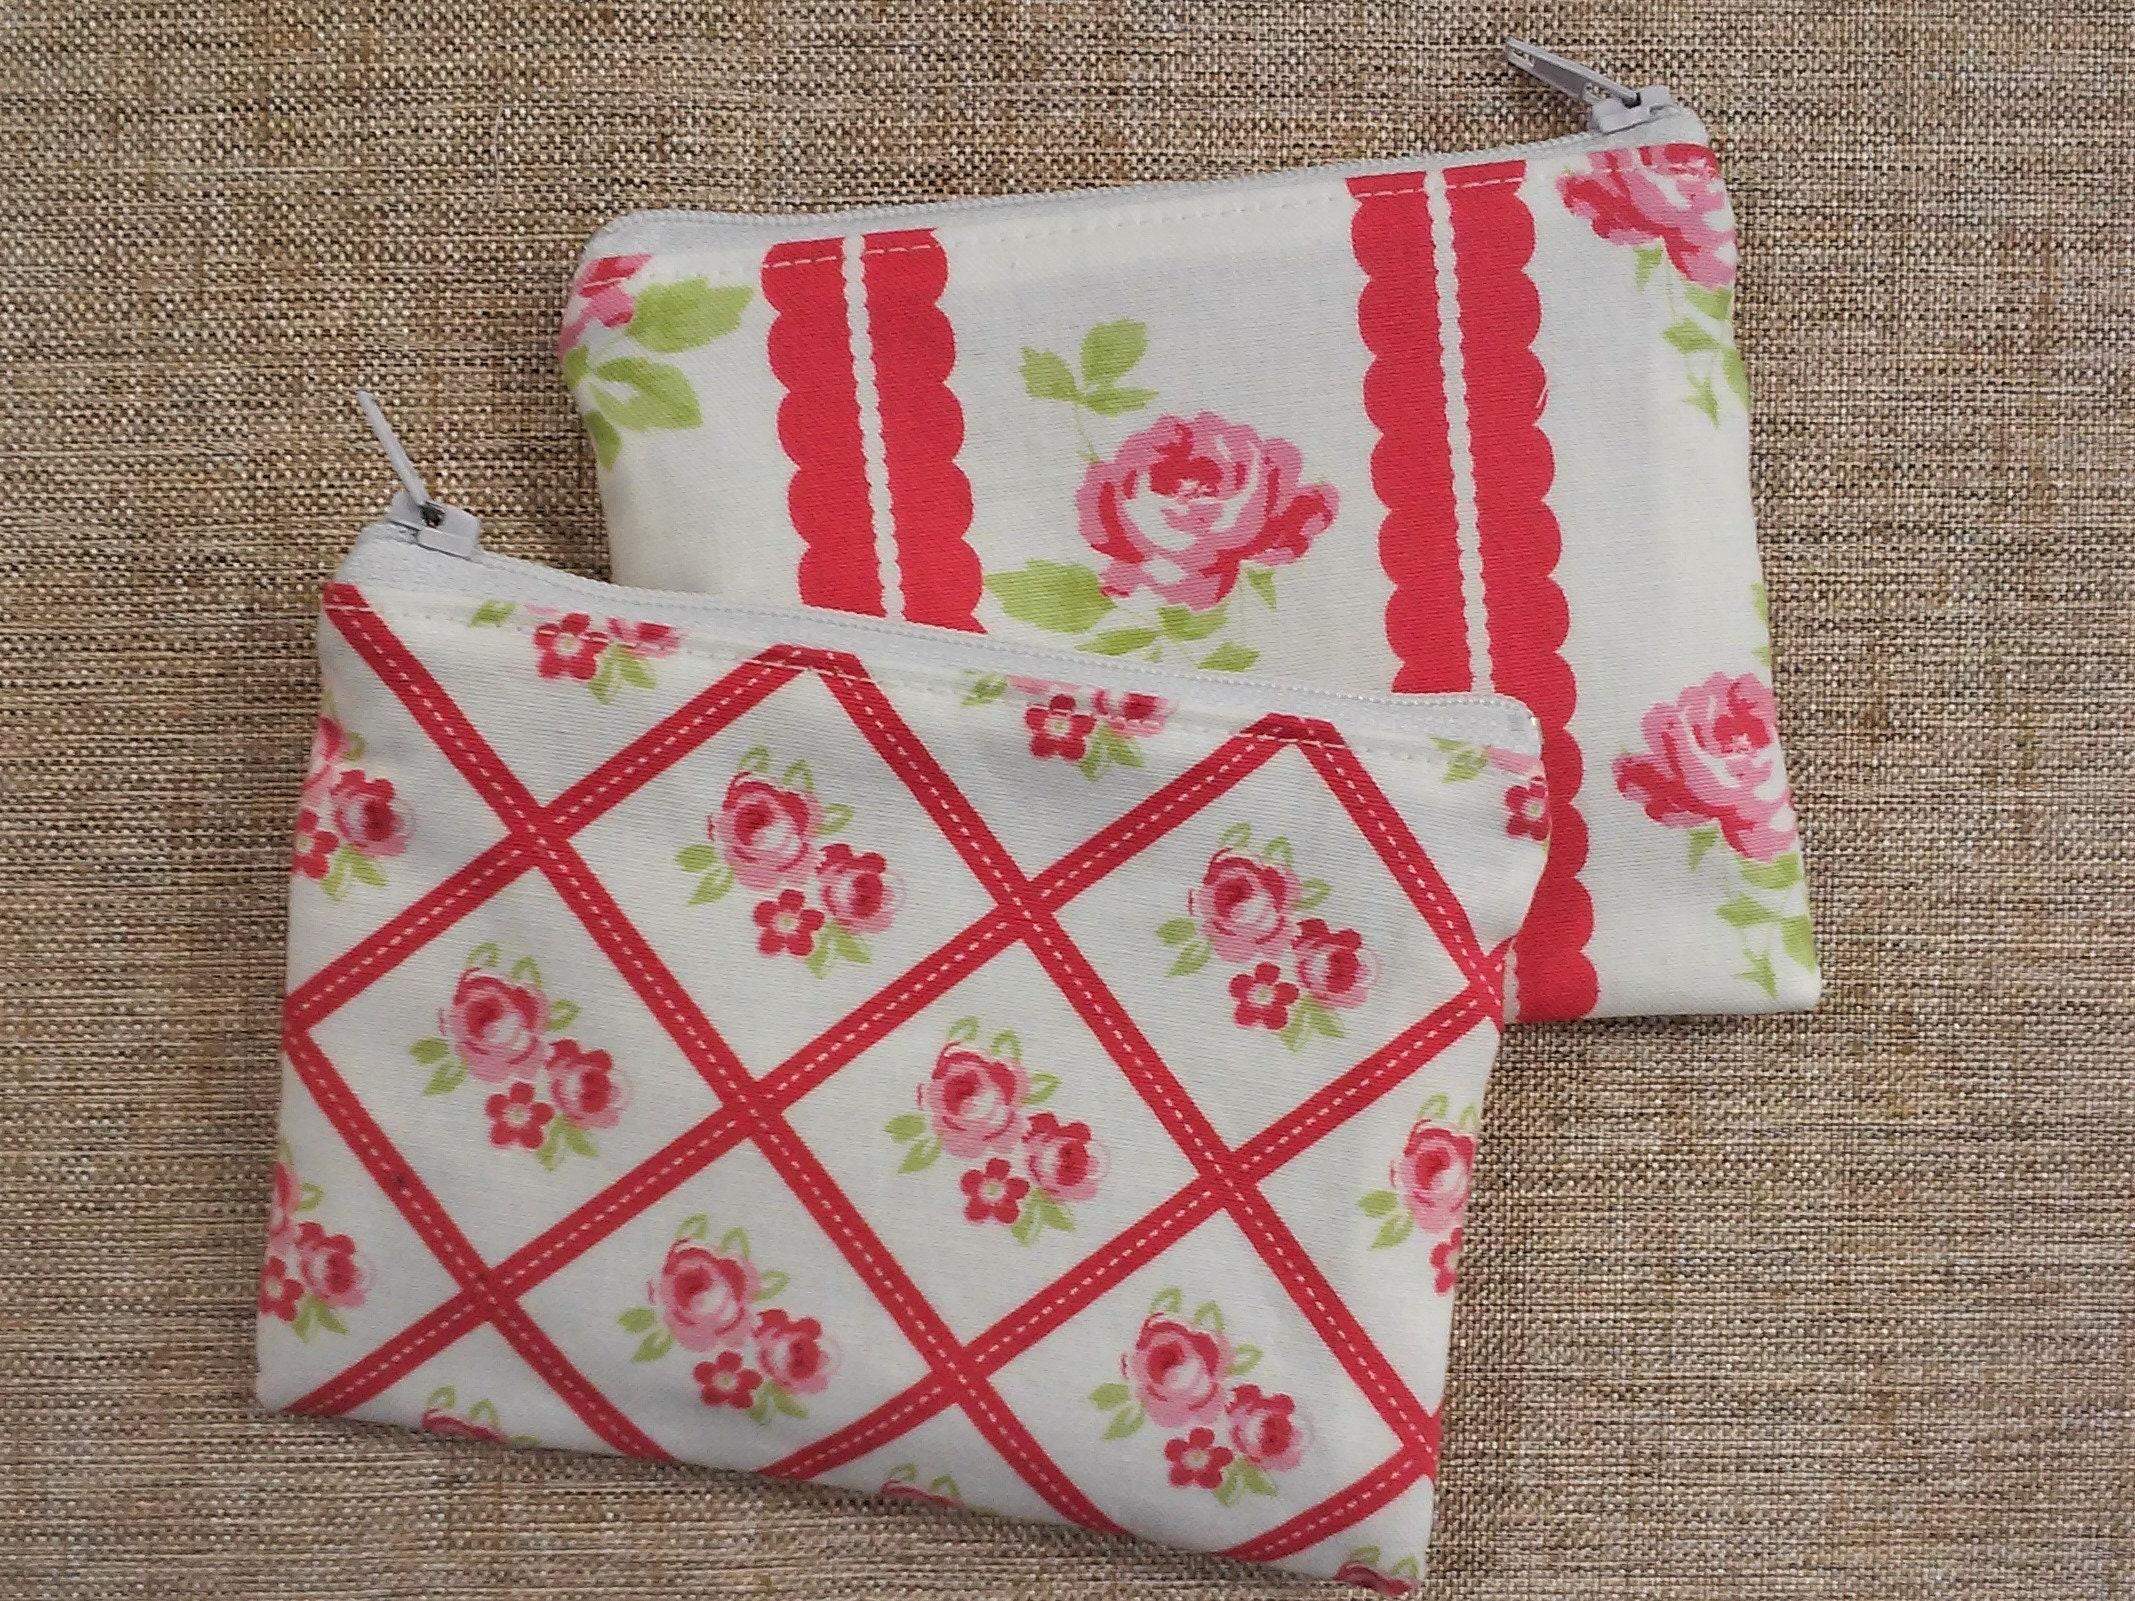 roses rouges plat style tissu petite pochette en plusieurs etsy. Black Bedroom Furniture Sets. Home Design Ideas